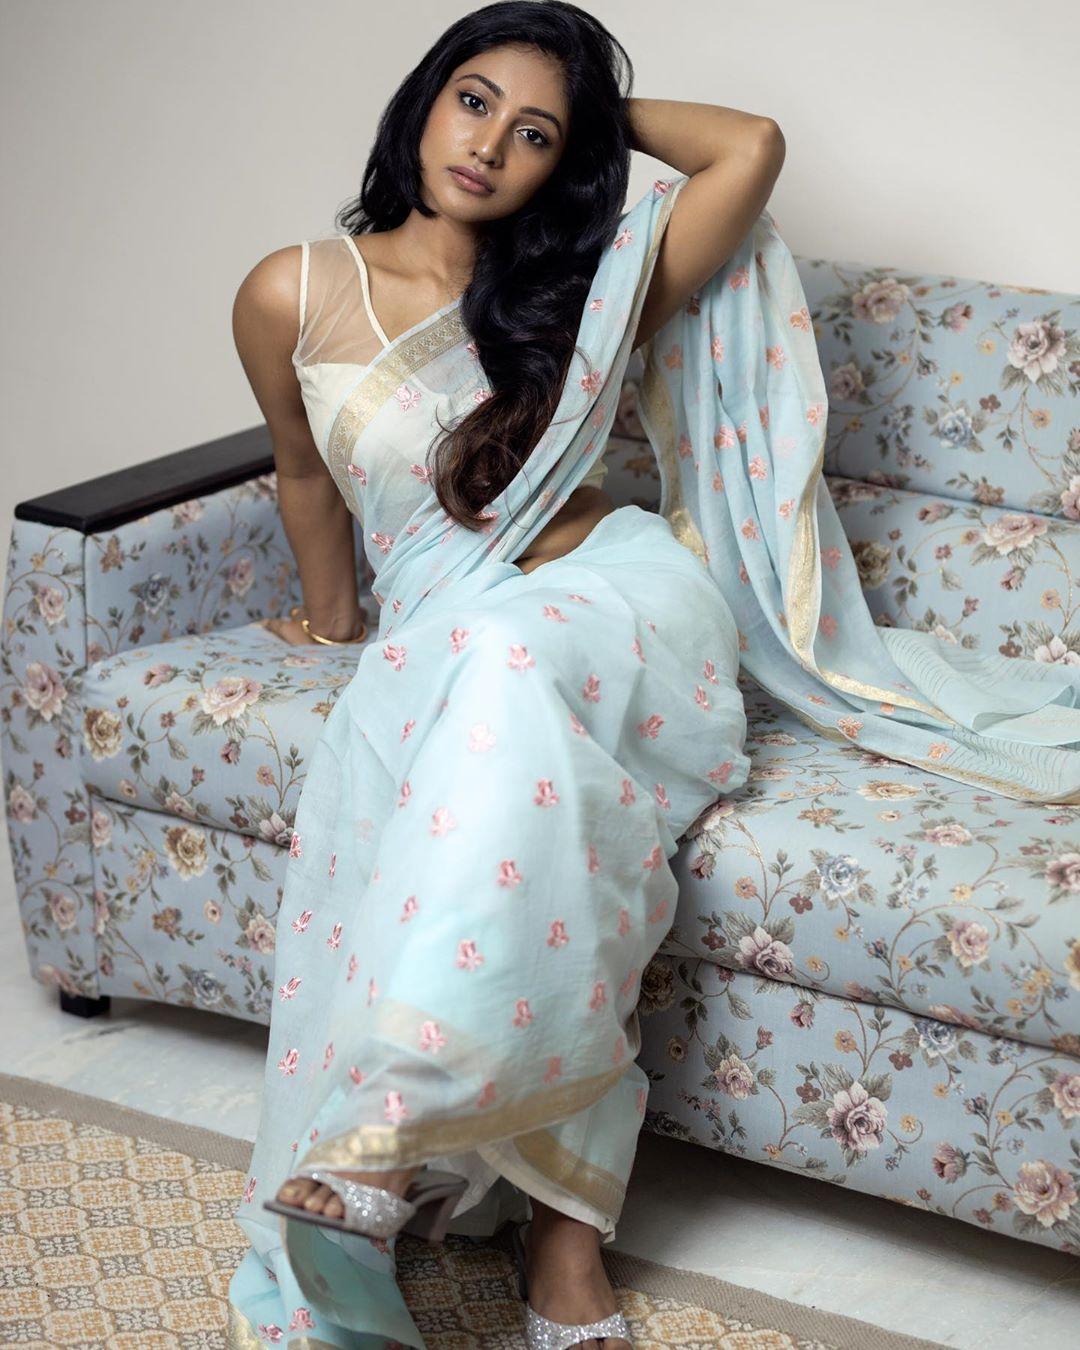 Bommu Lakshmi photos (55)